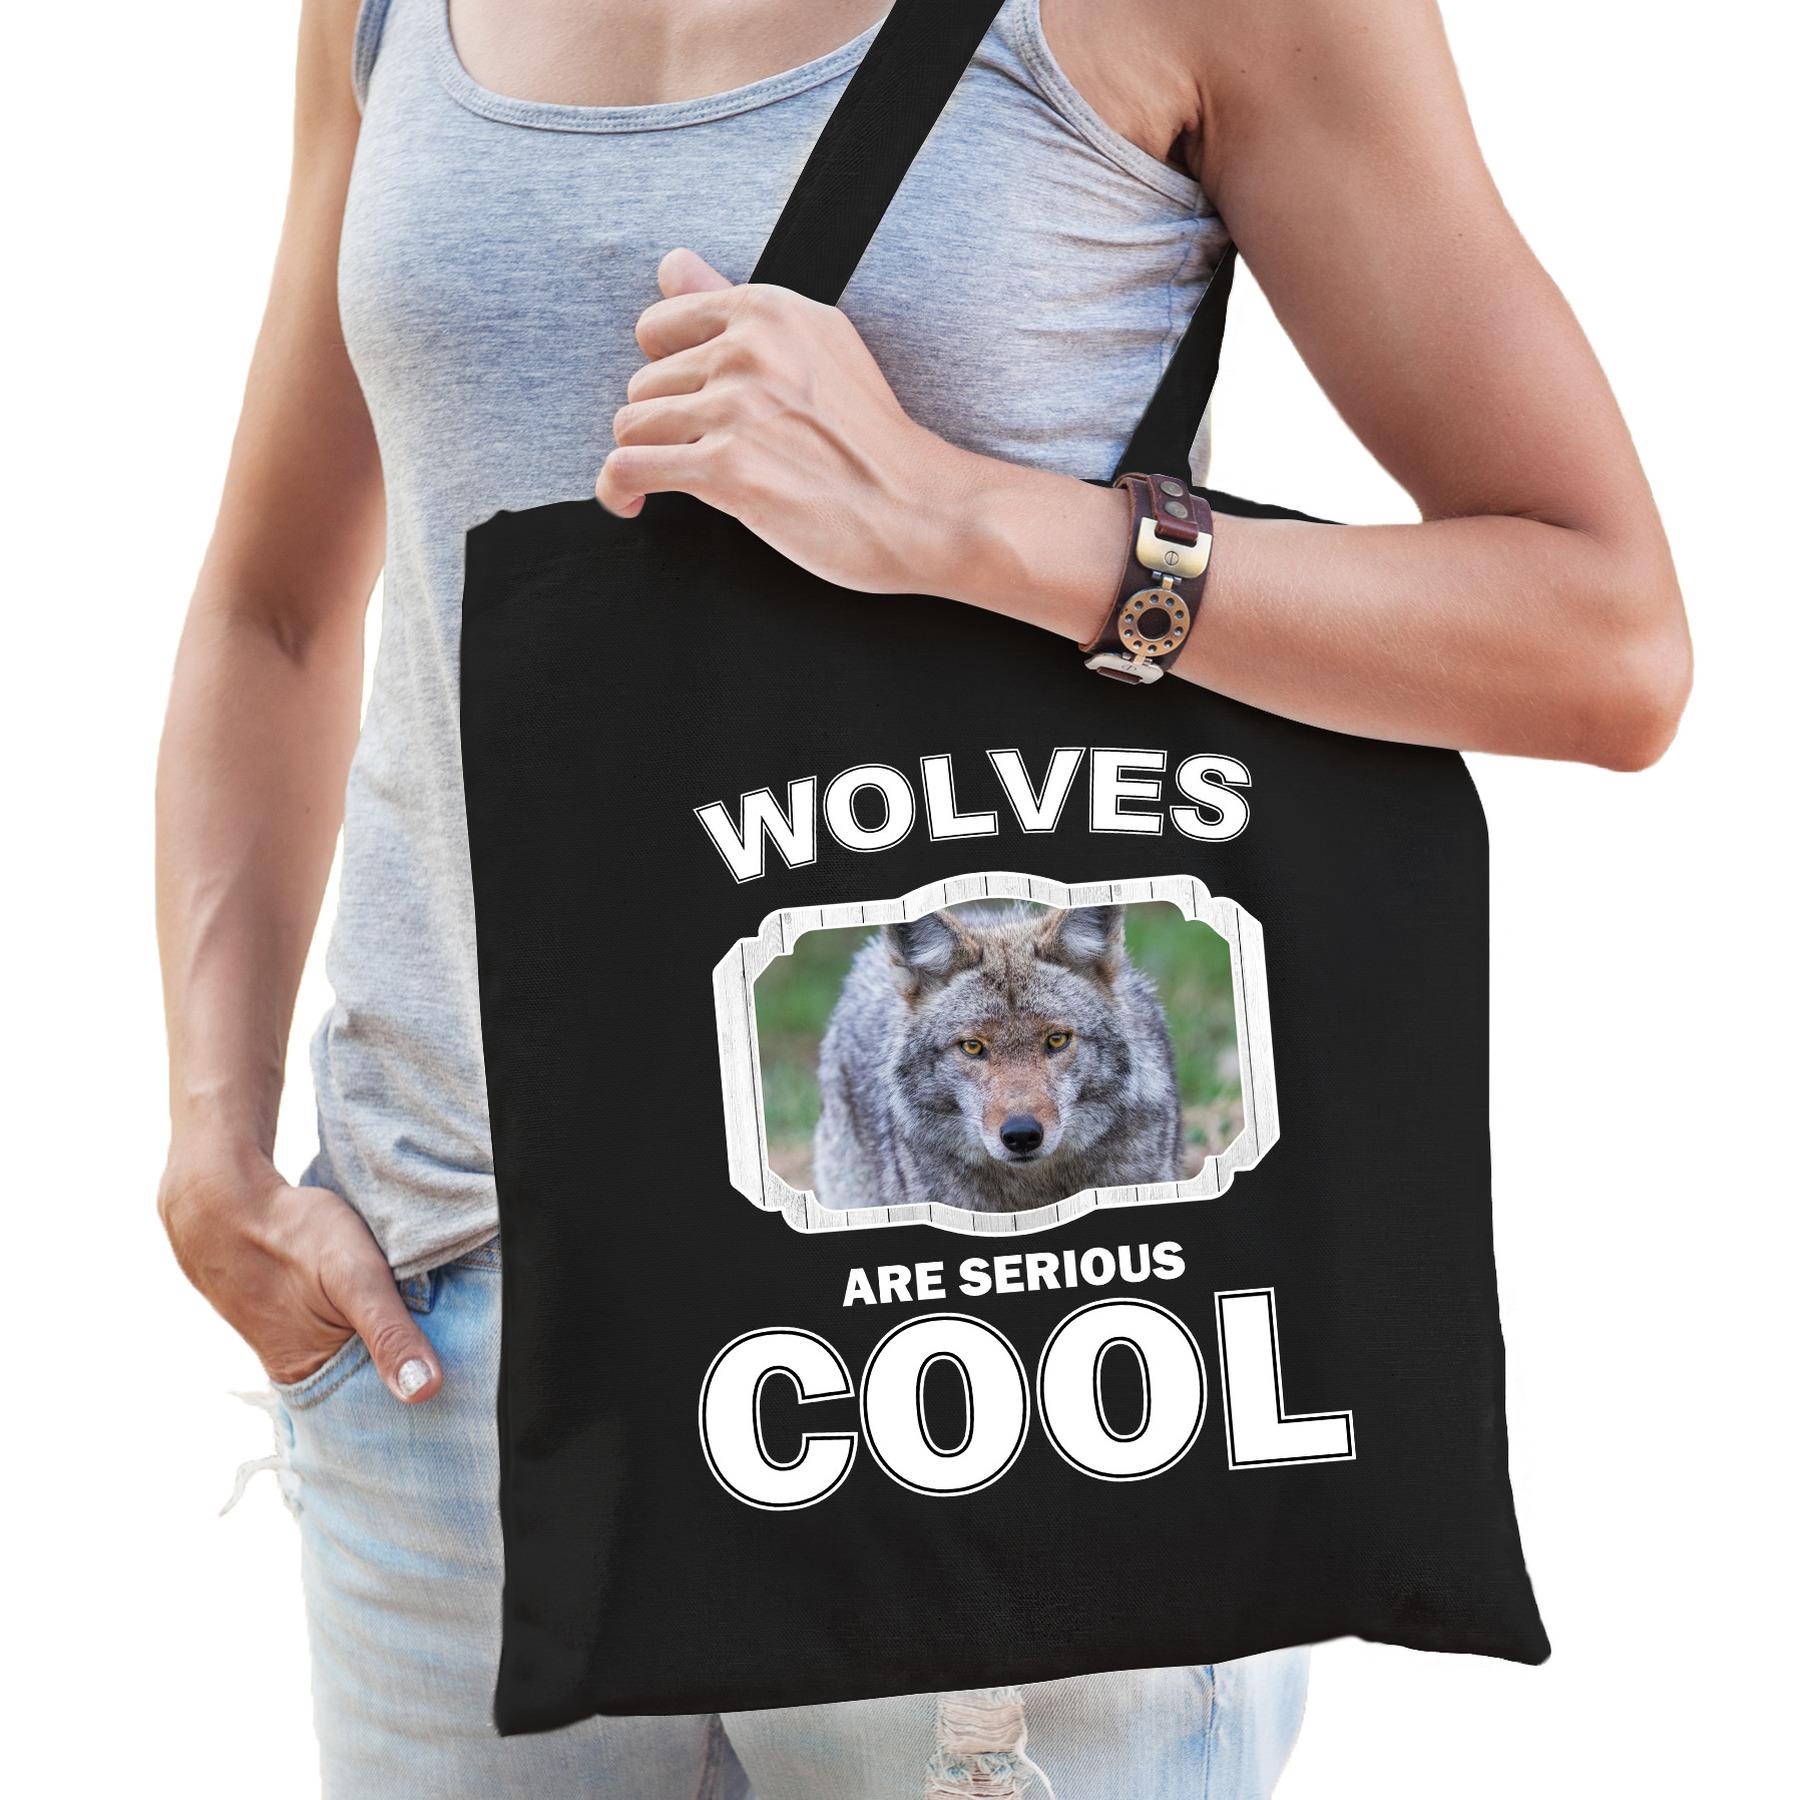 Katoenen tasje wolves are serious cool zwart - wolven/ wolf cadeau tas